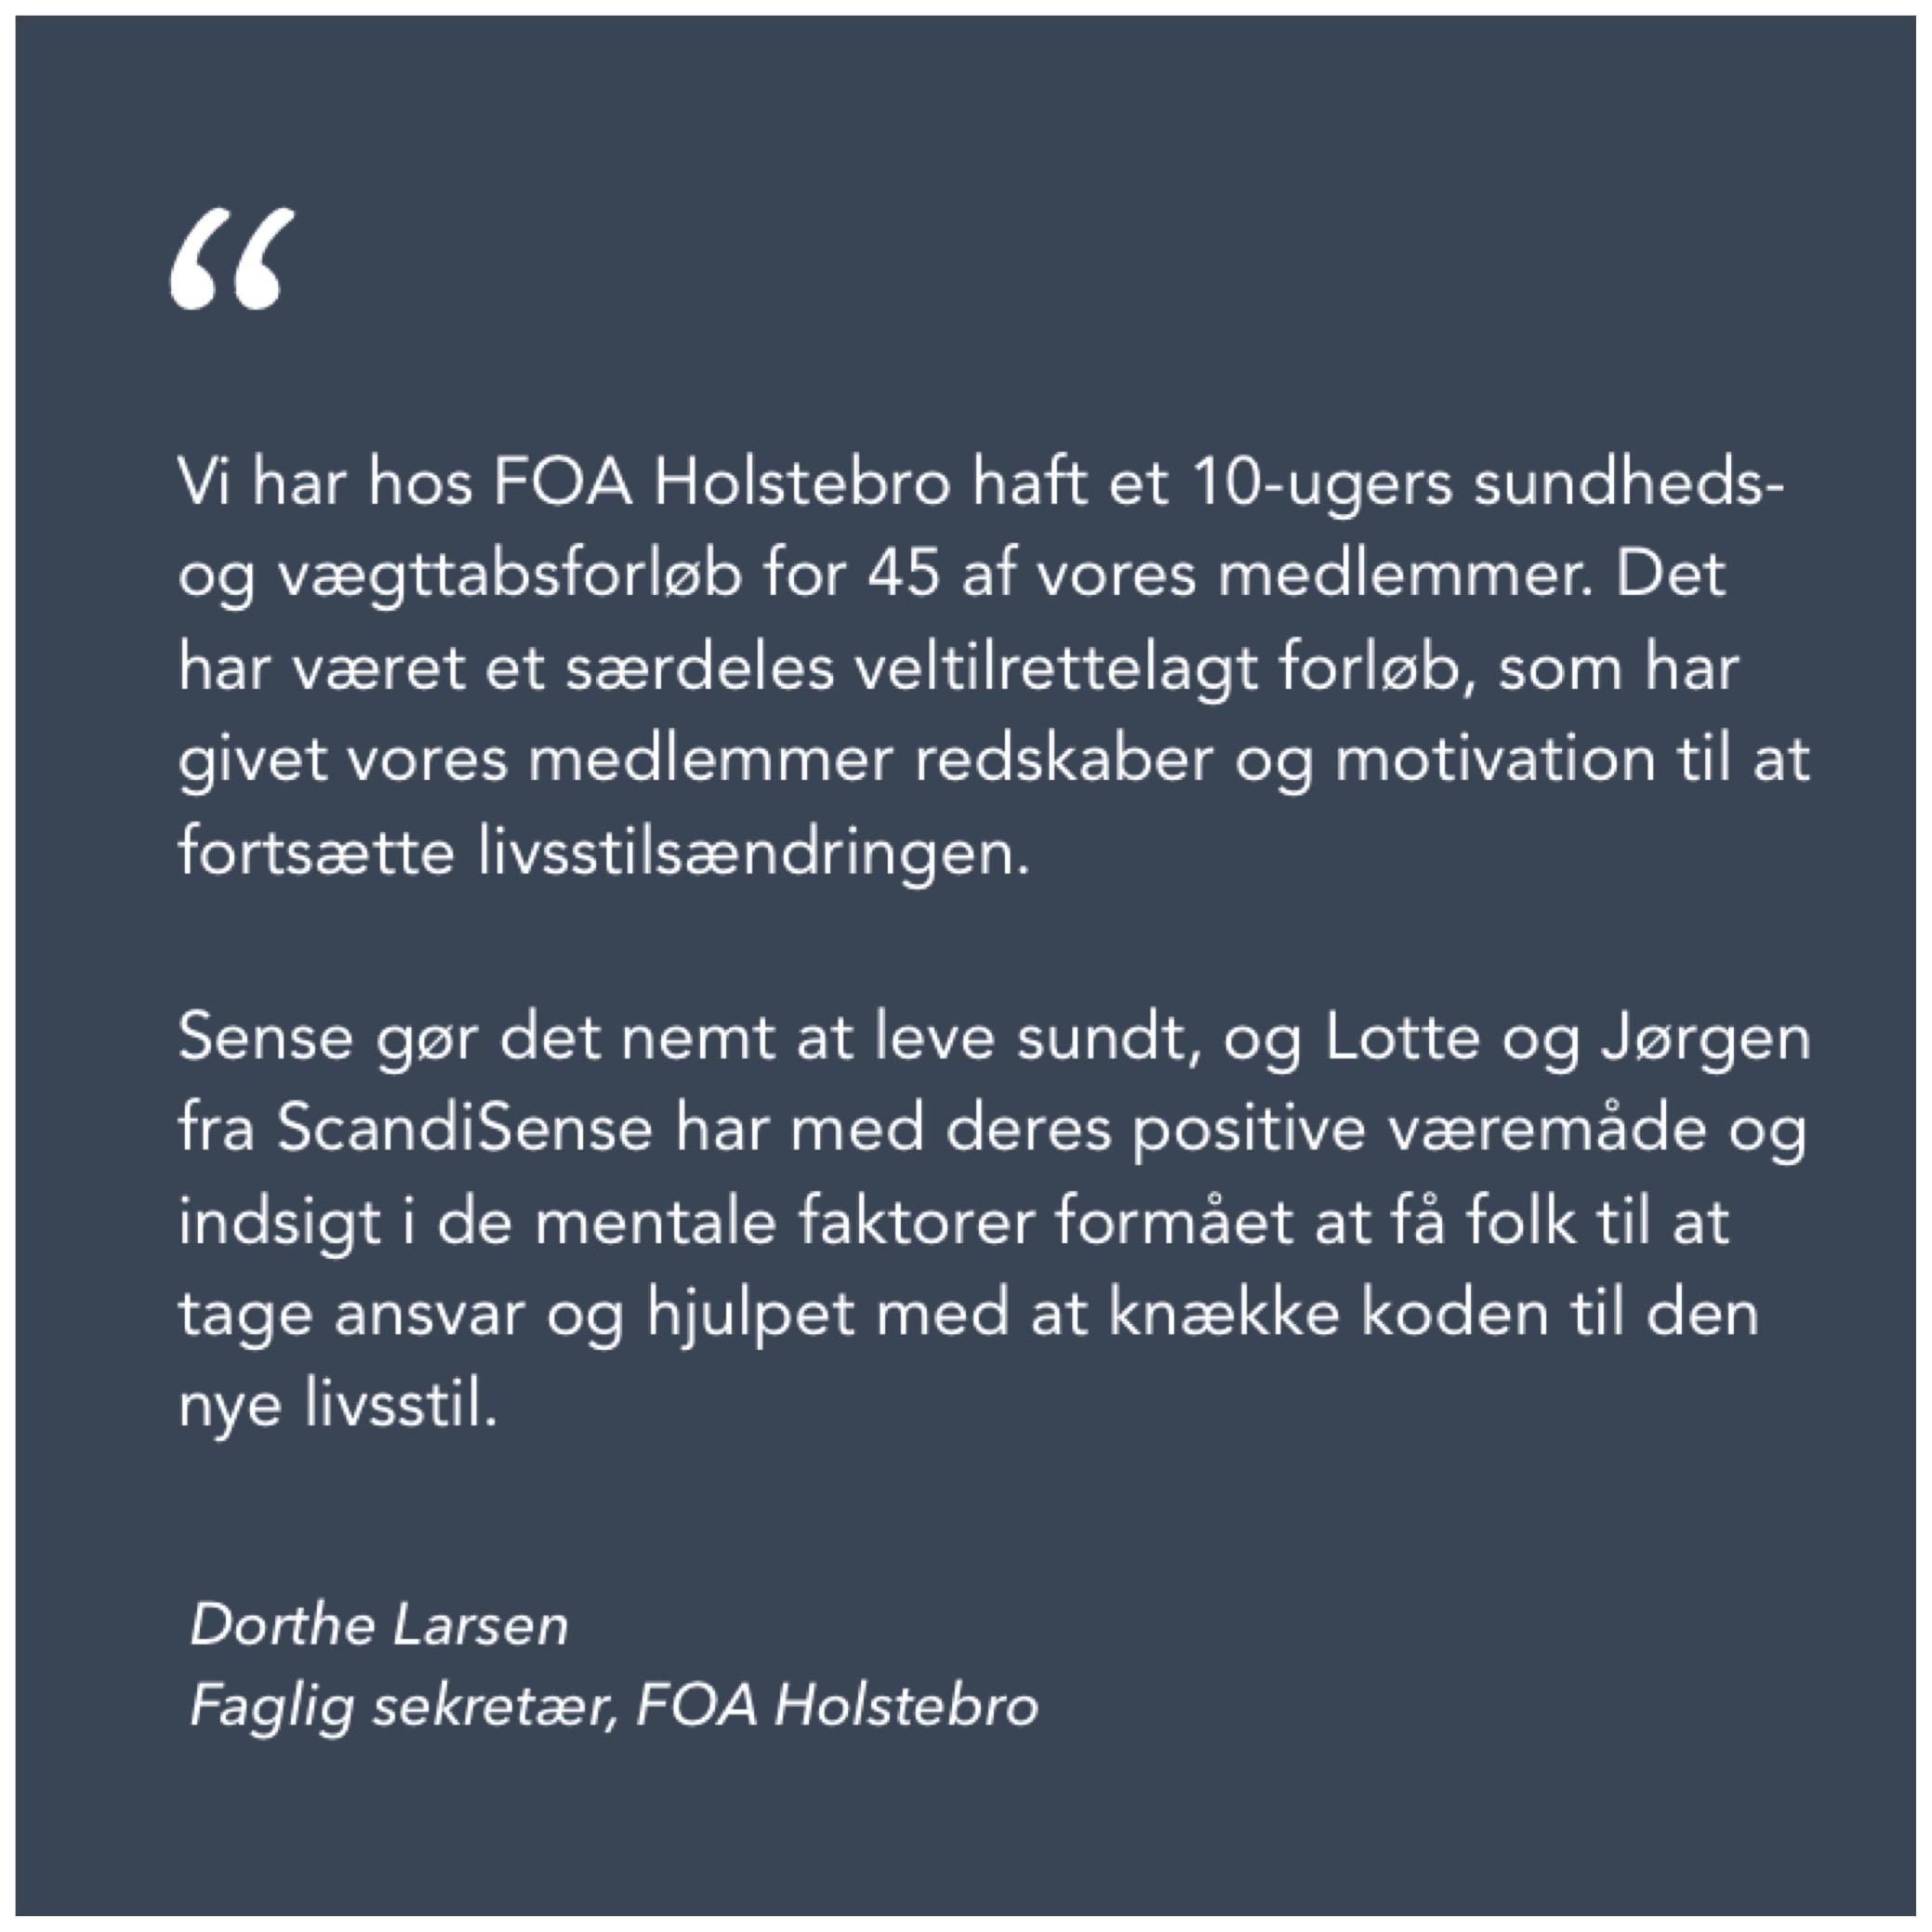 Udtalelse, FOA Holstebro.jpg